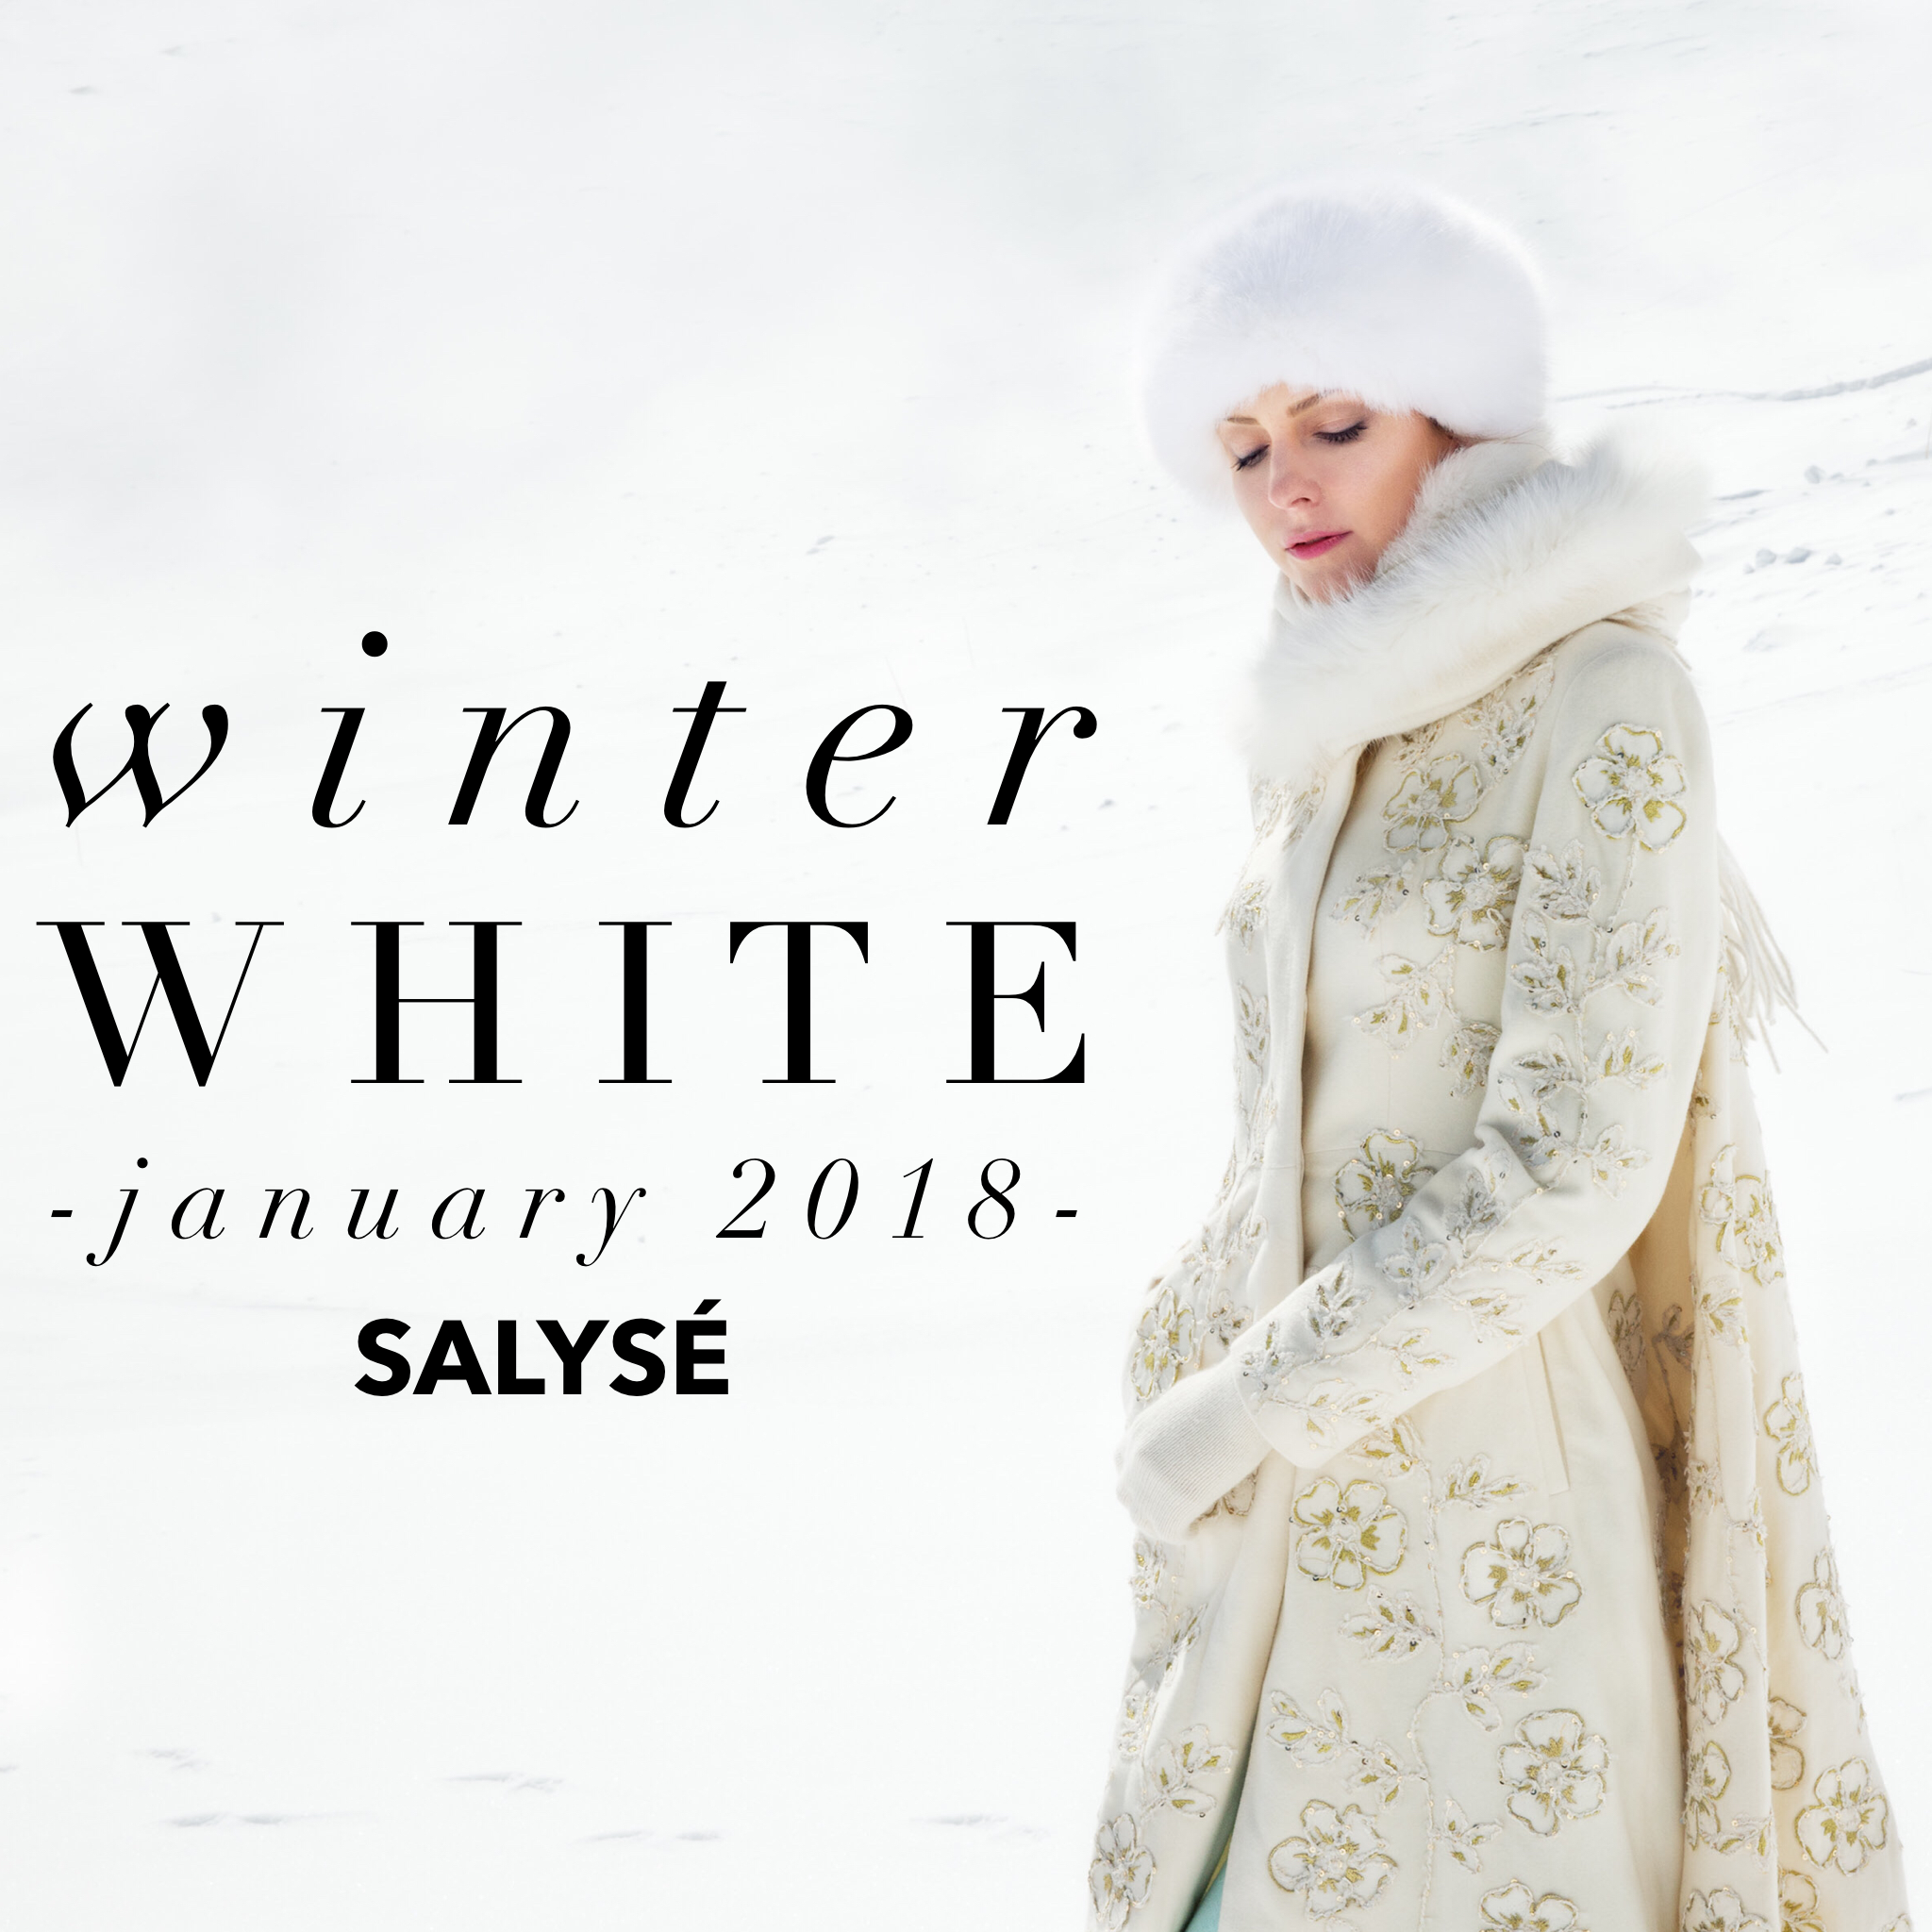 SNOW ANGEL   Photographer: Aliona Kuznetsova; Model: Sylvia Minkova; Hair Stylist and Makeup Artist: Elisabeth Péclard; Stylist: Sodgerel Yadamtsoo;